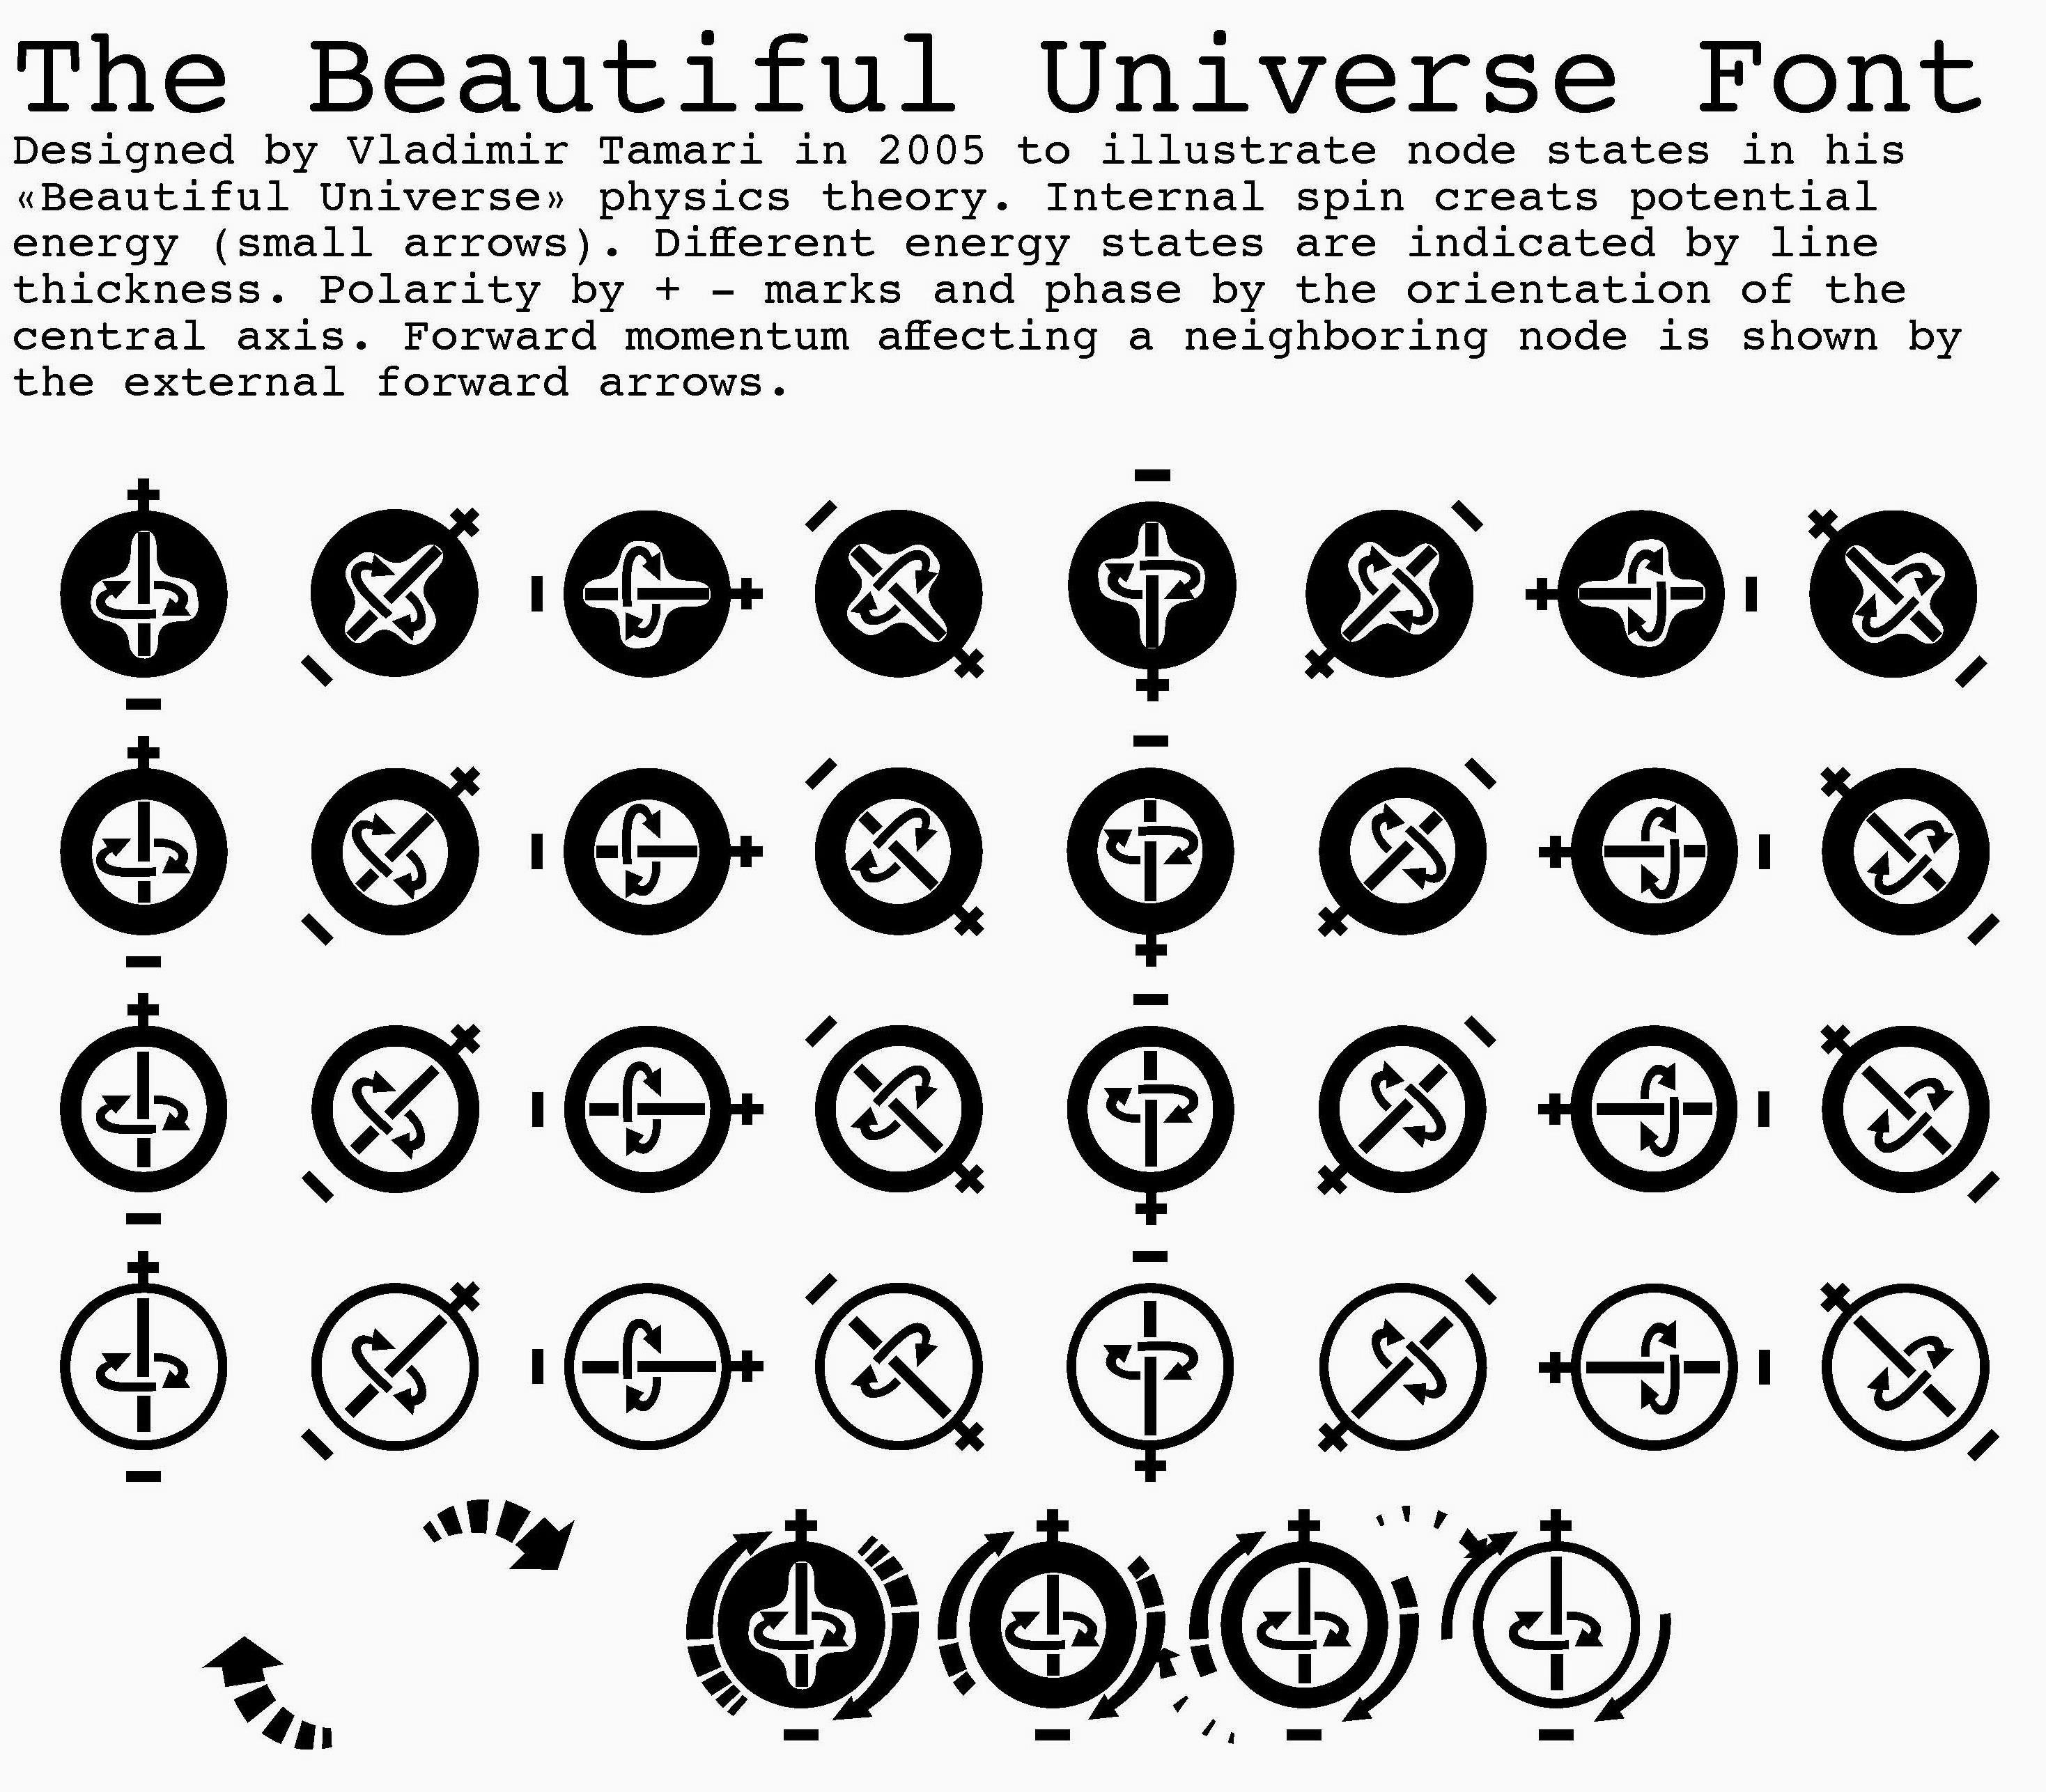 Vladimir tamari a physics symbol font designed to illustrate his physics theory buycottarizona